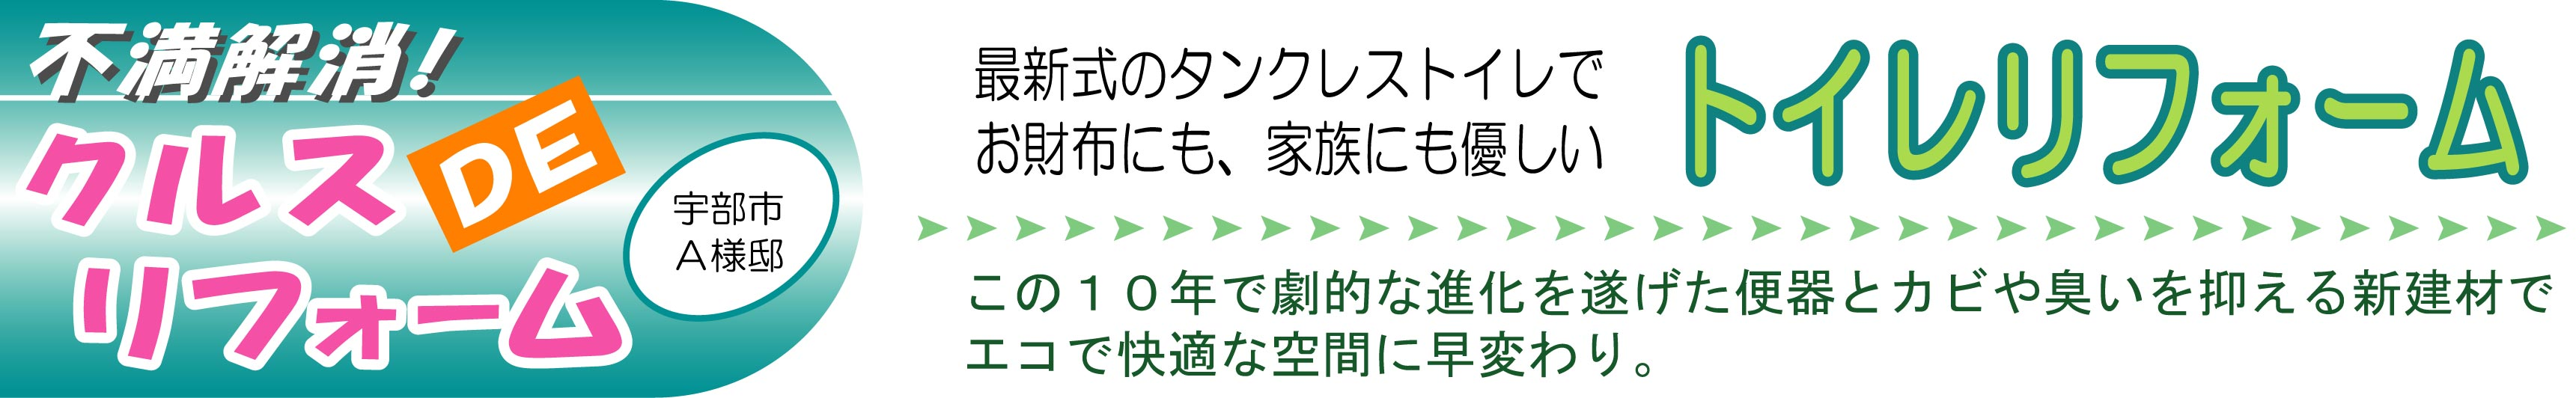 KuraSi-natu-sin80-05.jpg